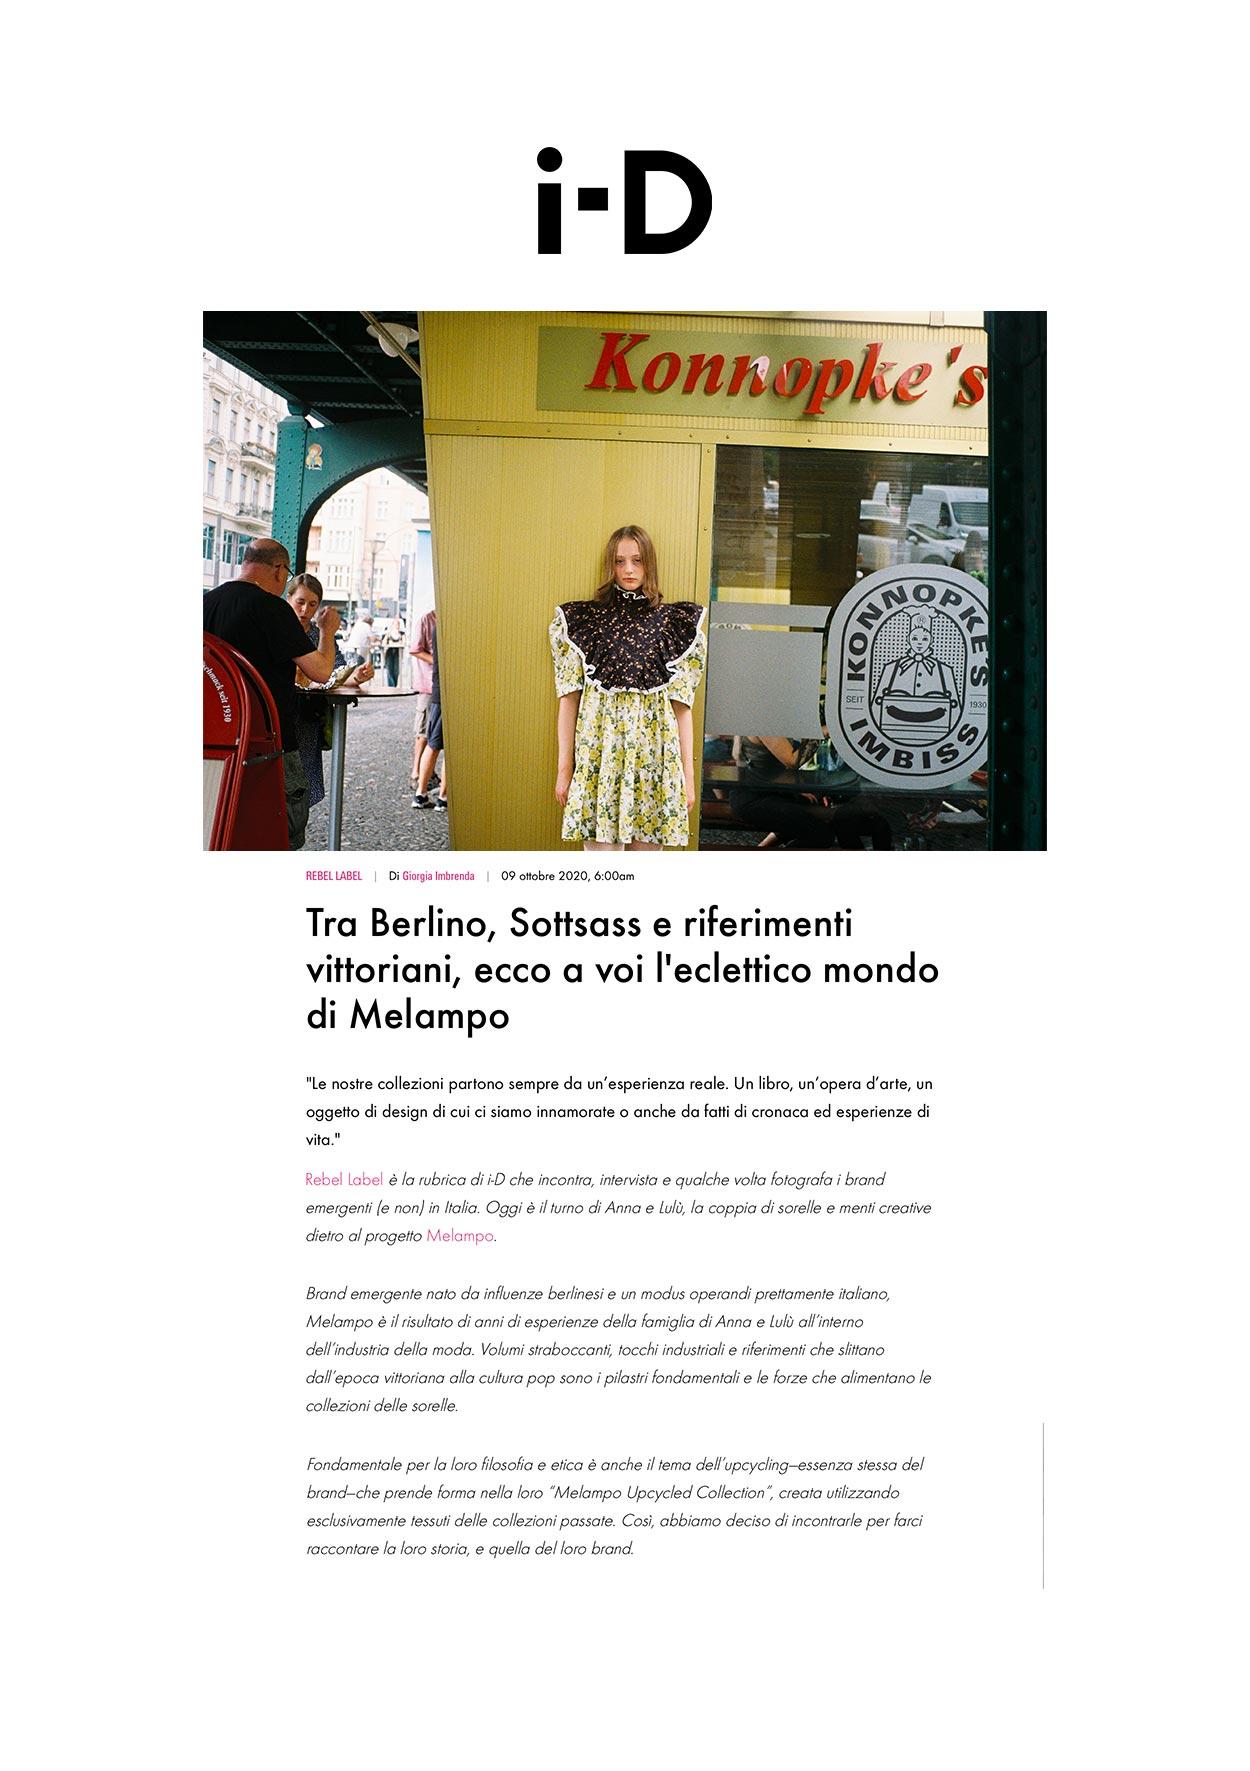 melampo interview on i.D magazine - photo 1